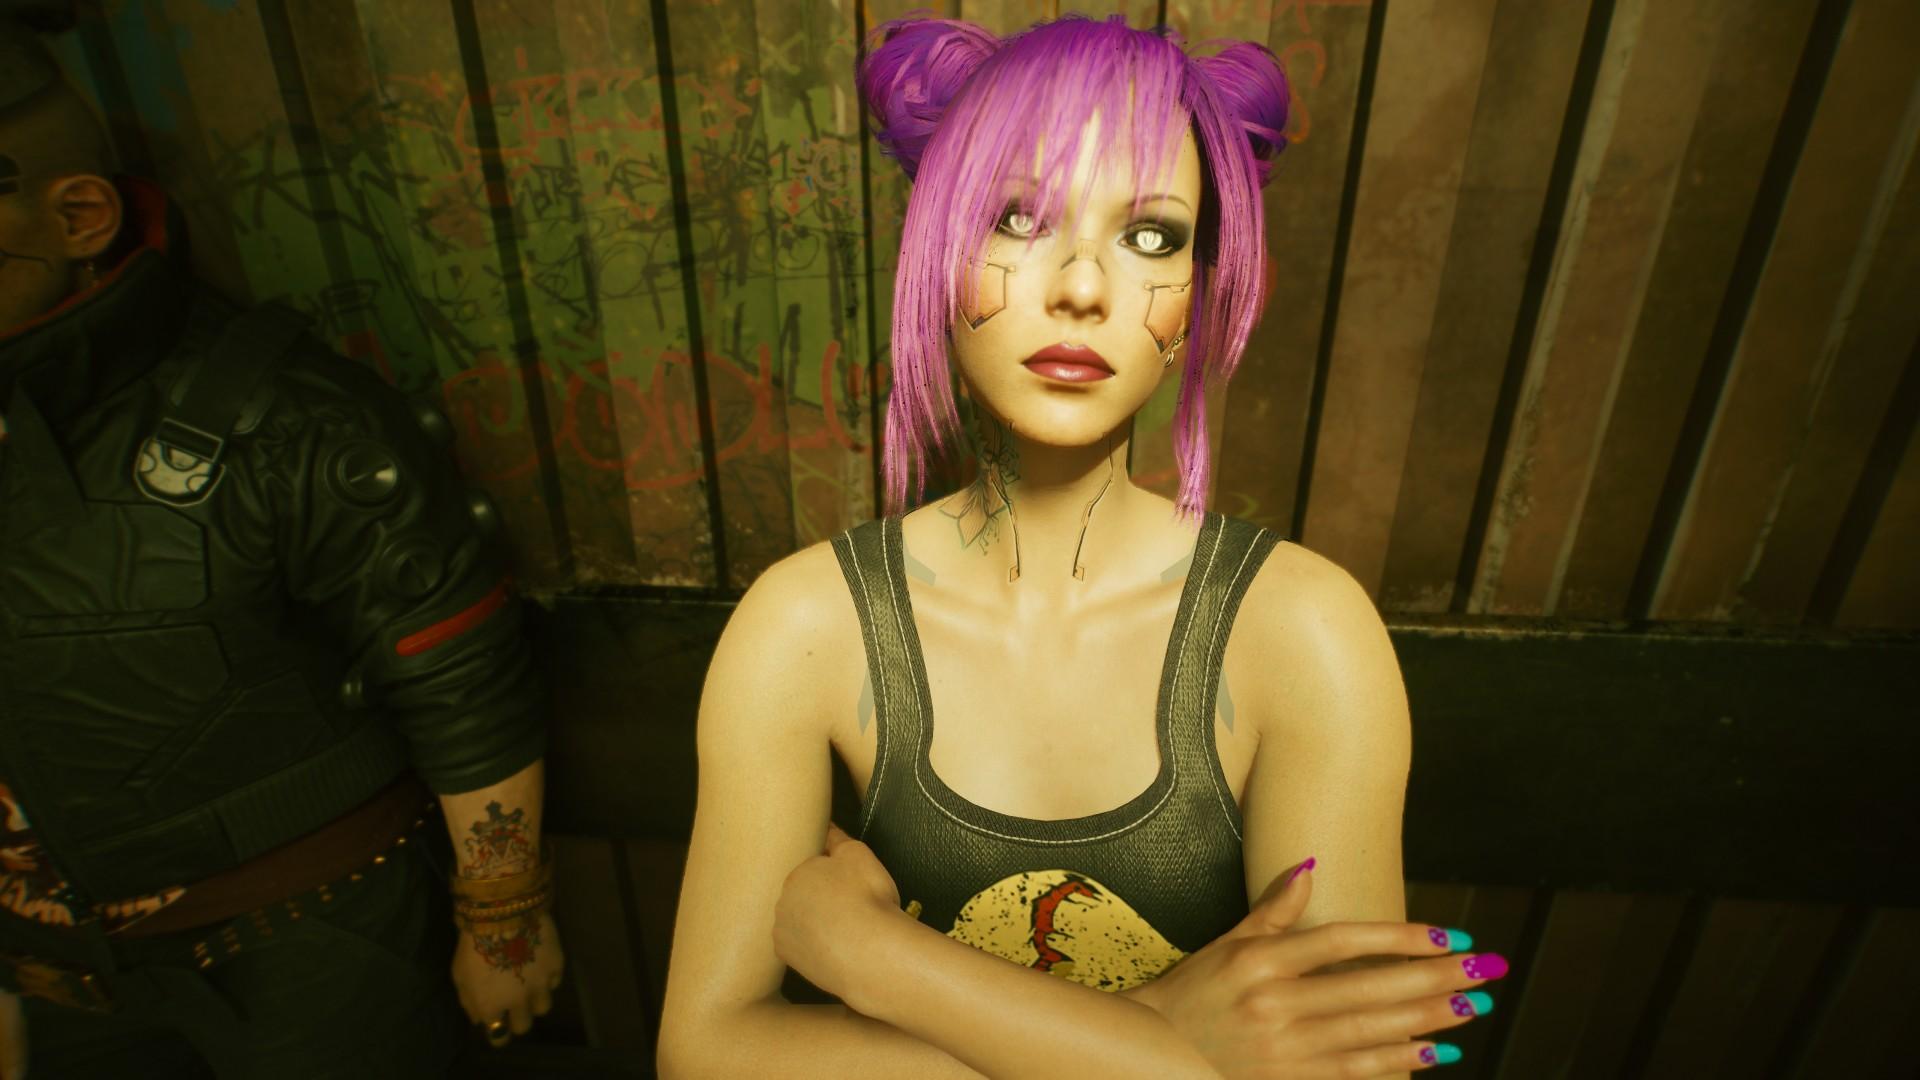 Cyberpunk 2077 Female Nomad V: Game Saves